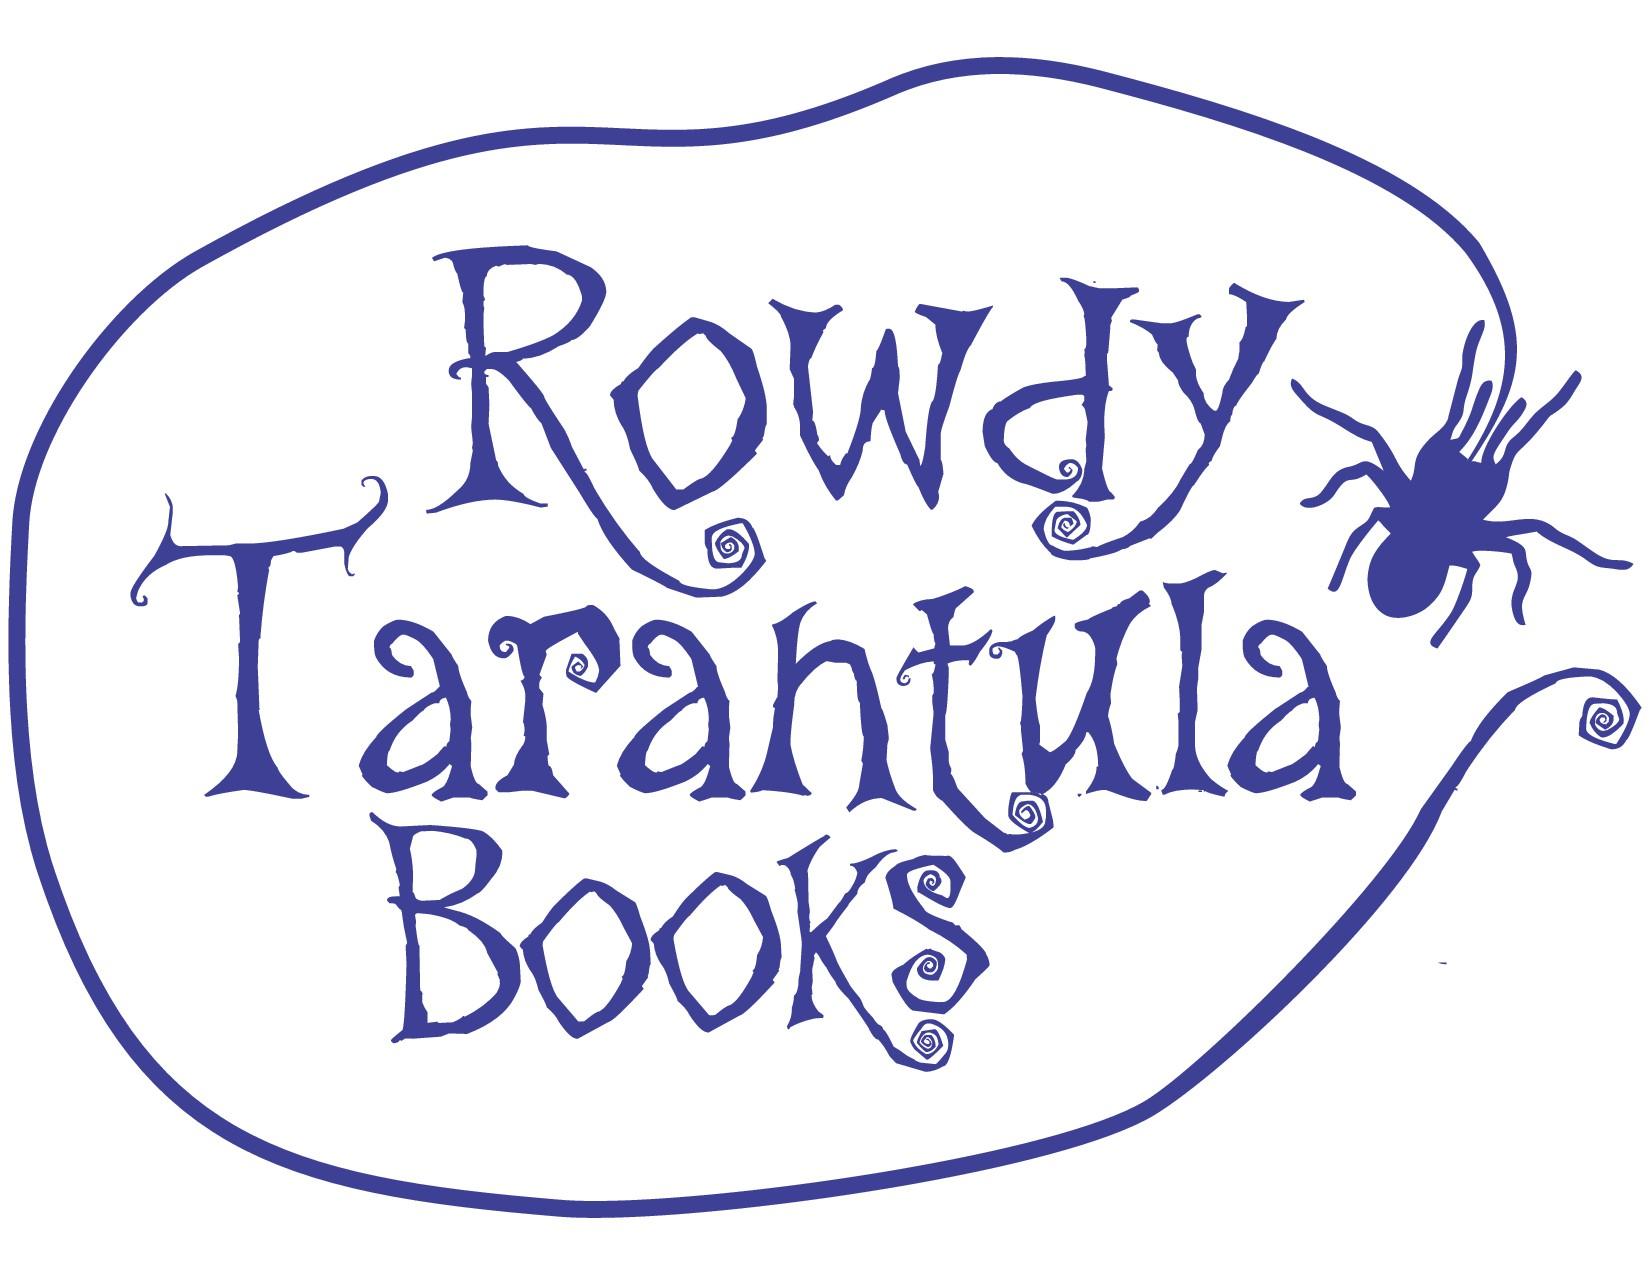 The Rowdy Tarantula